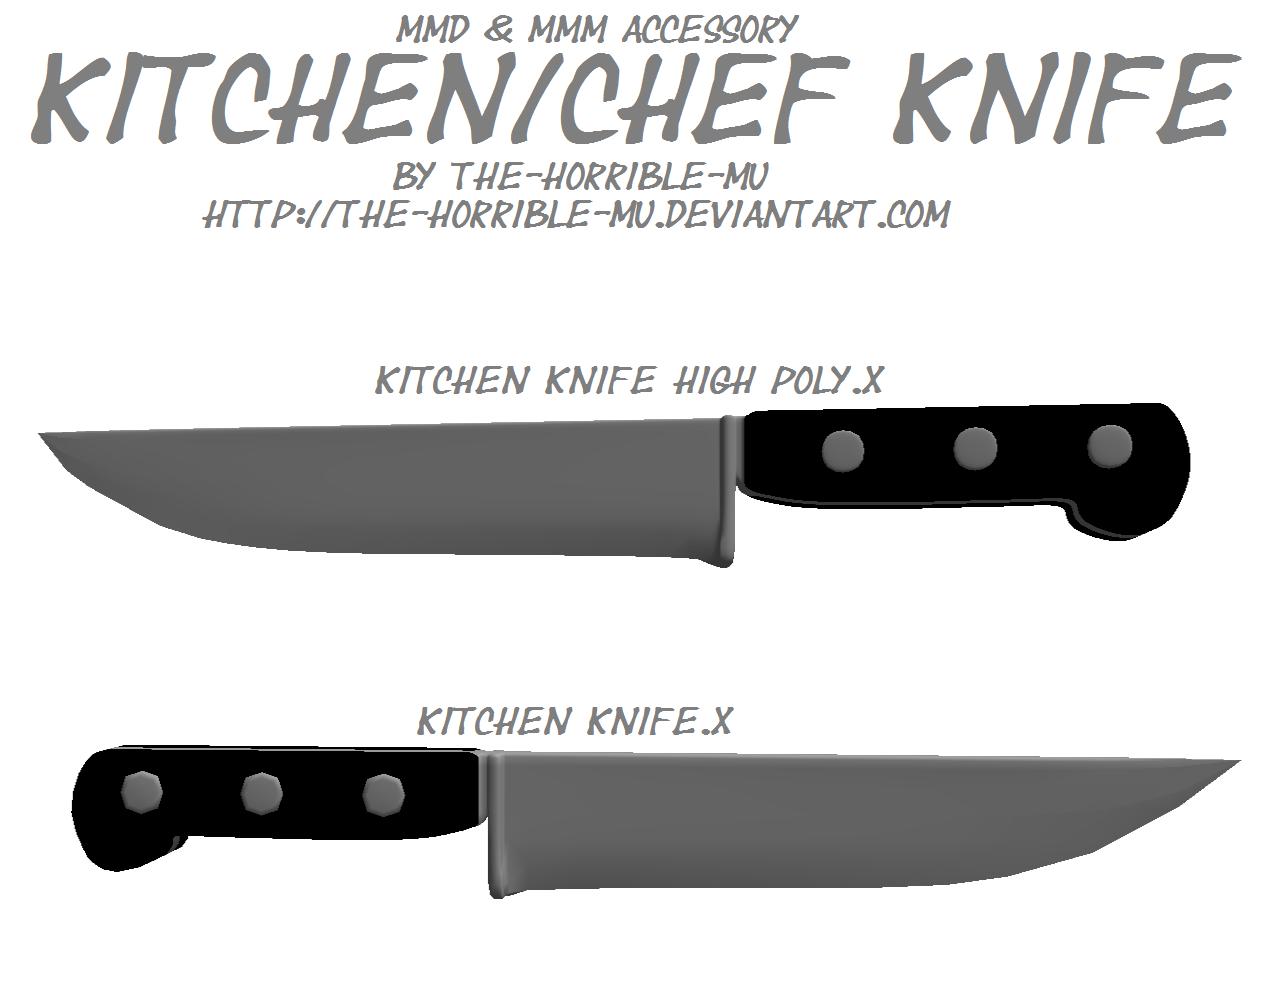 mmd accessory kitchen knife dl horrible kitchen teaching kitchen ...